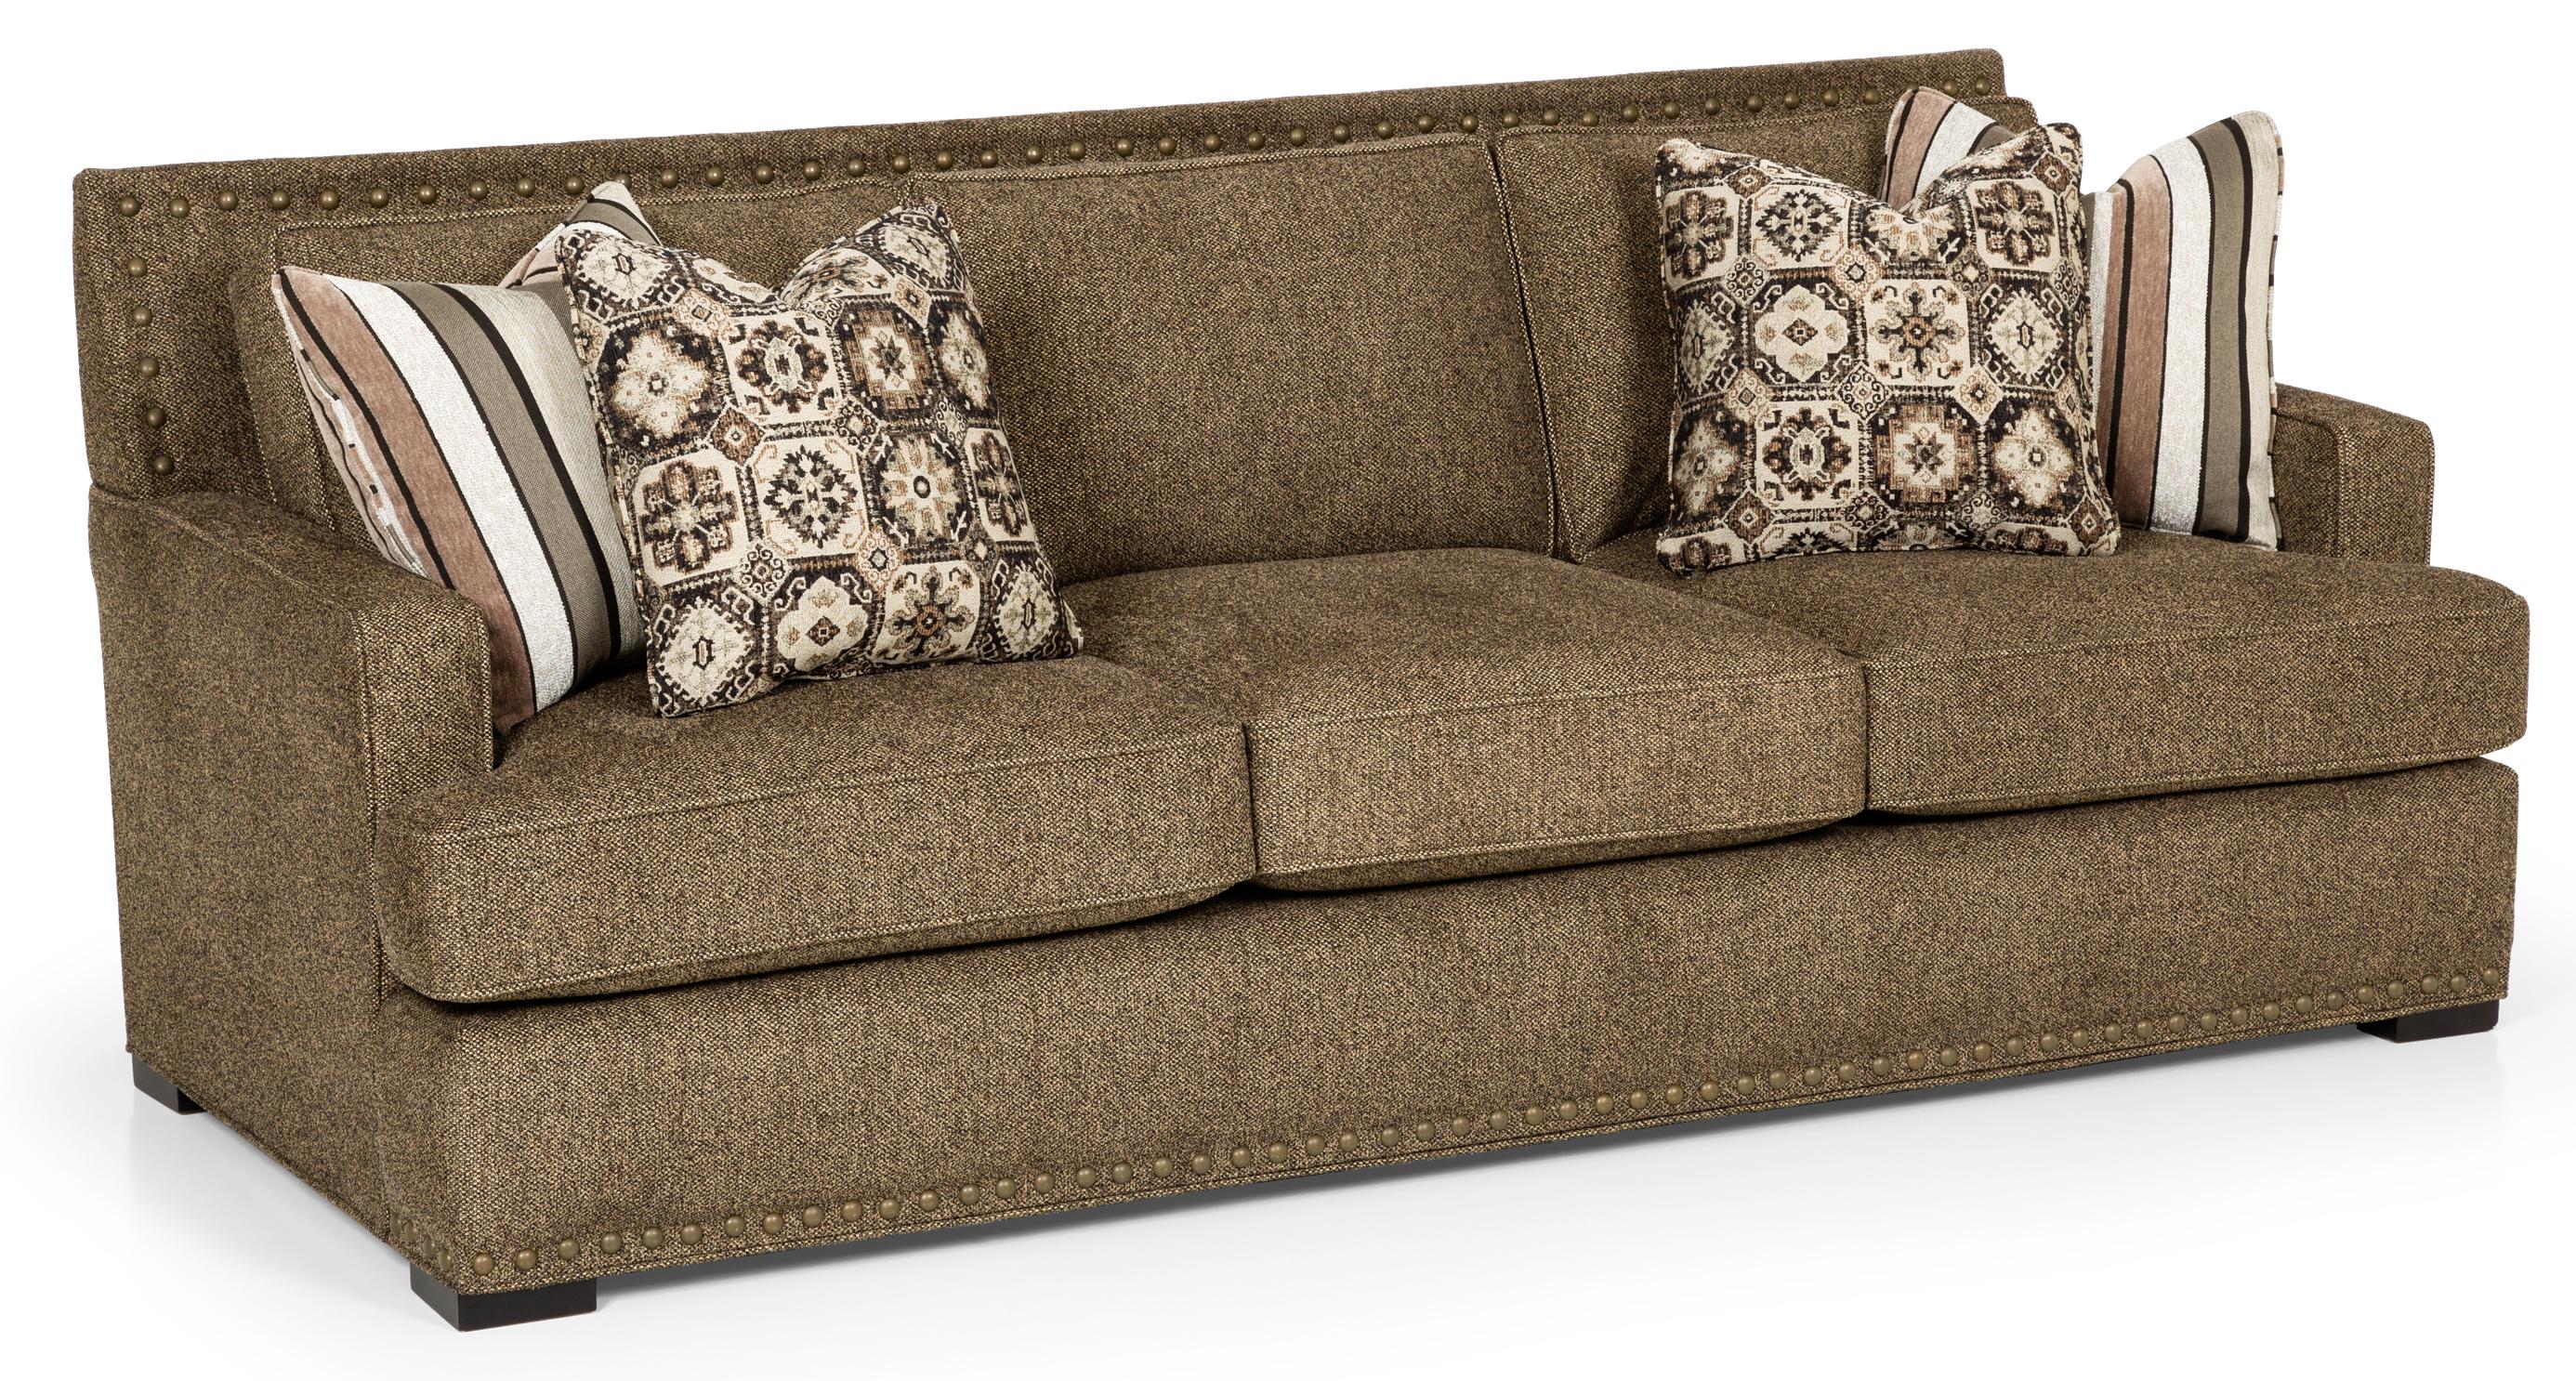 pratts corner sofas sofa italia welcome to stanton